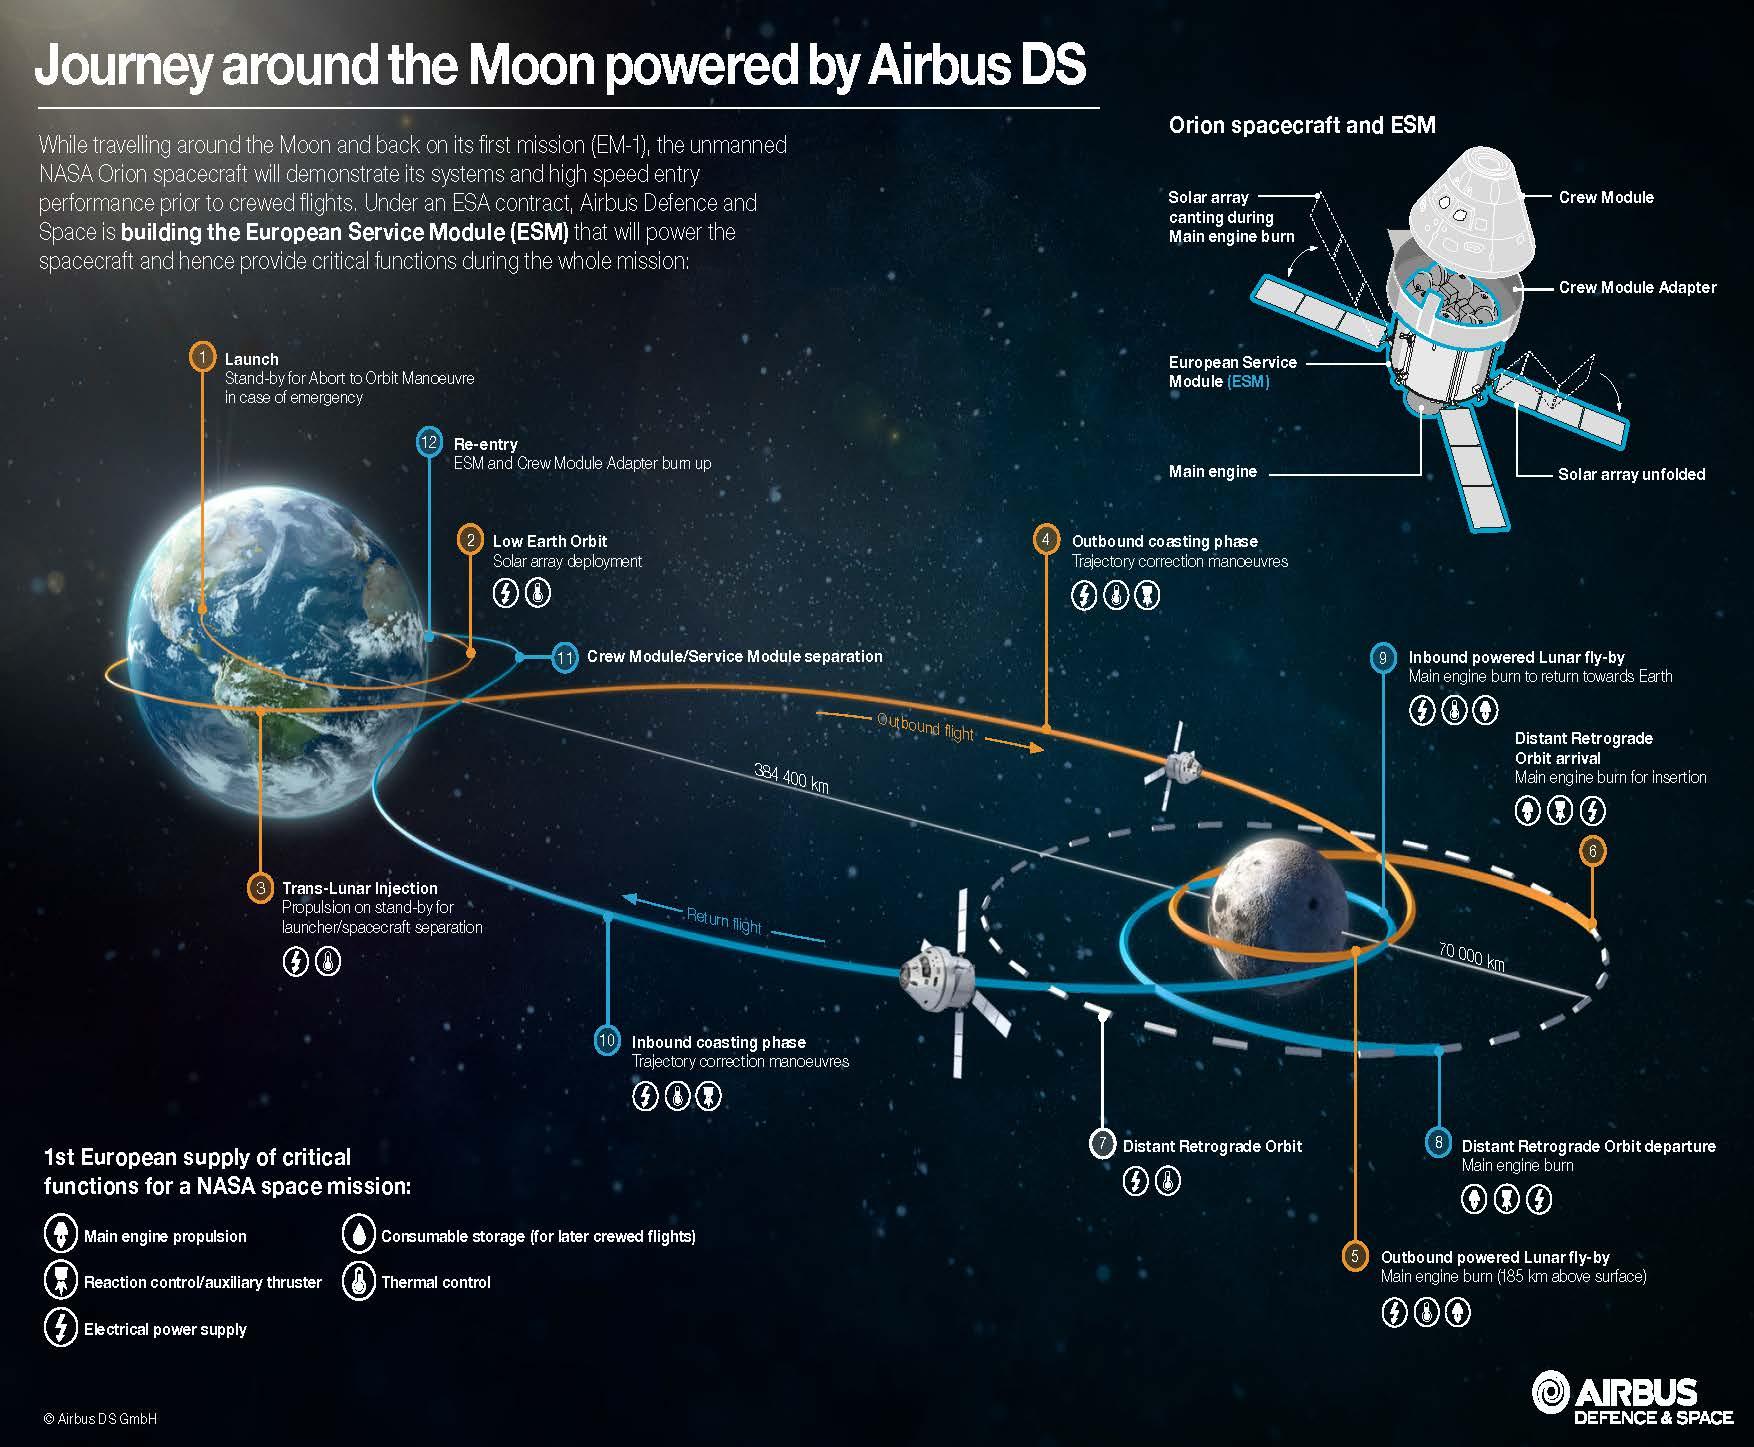 Orion - EM-1 - trajektorie letu